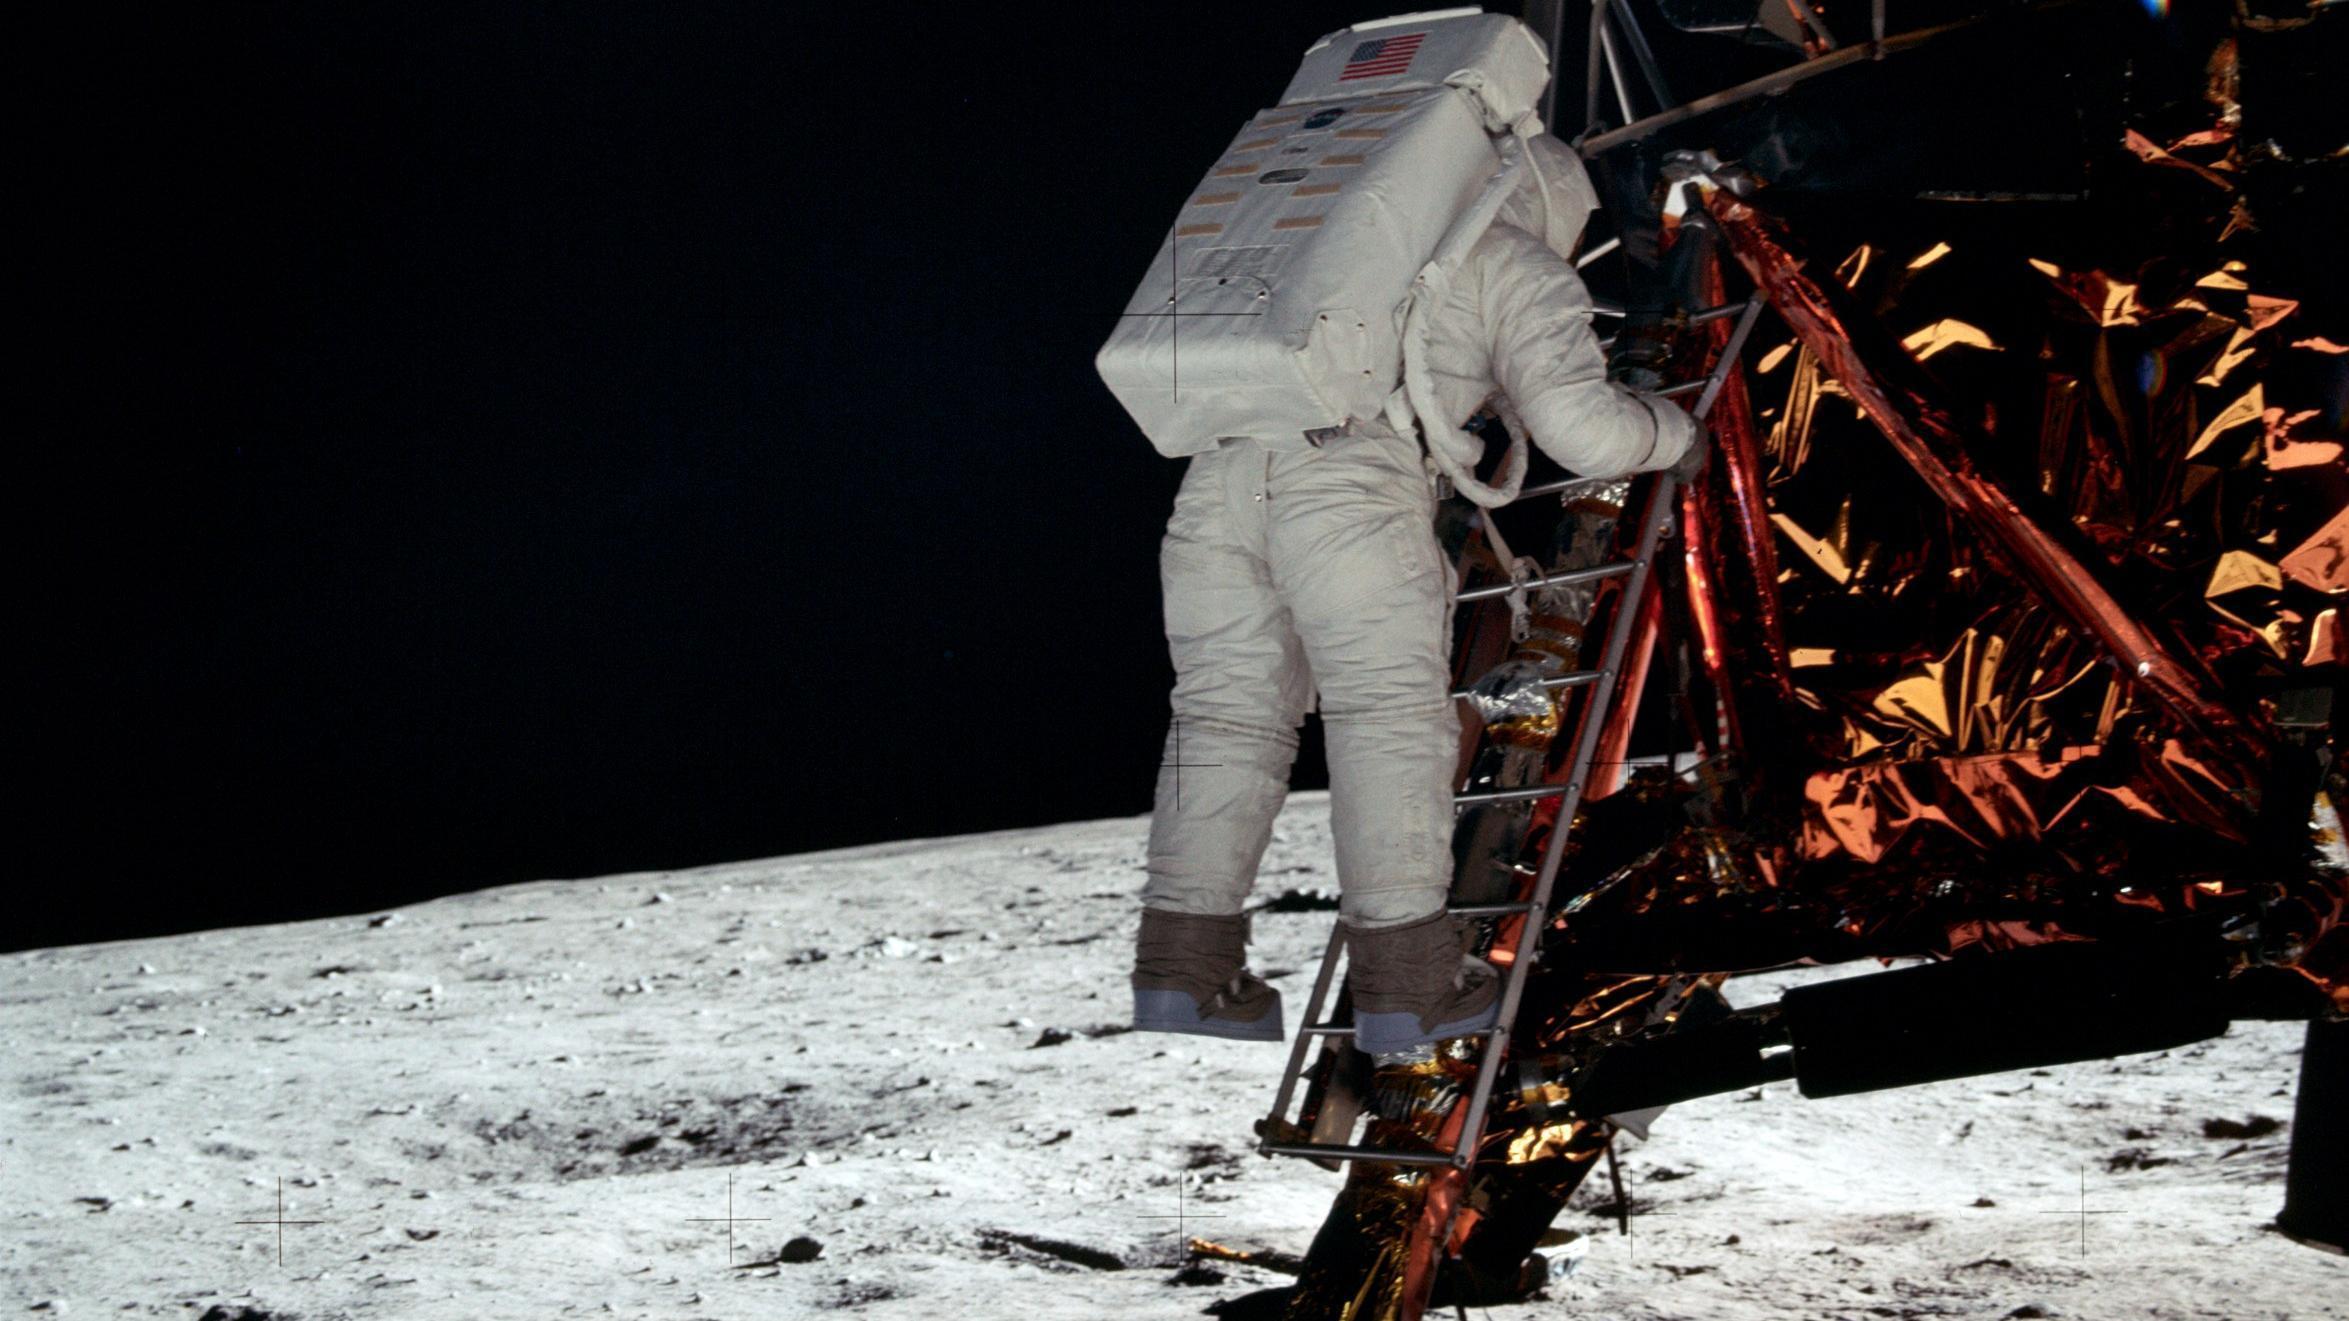 Apollo 11 Wallpapers - Wallpaper Cave